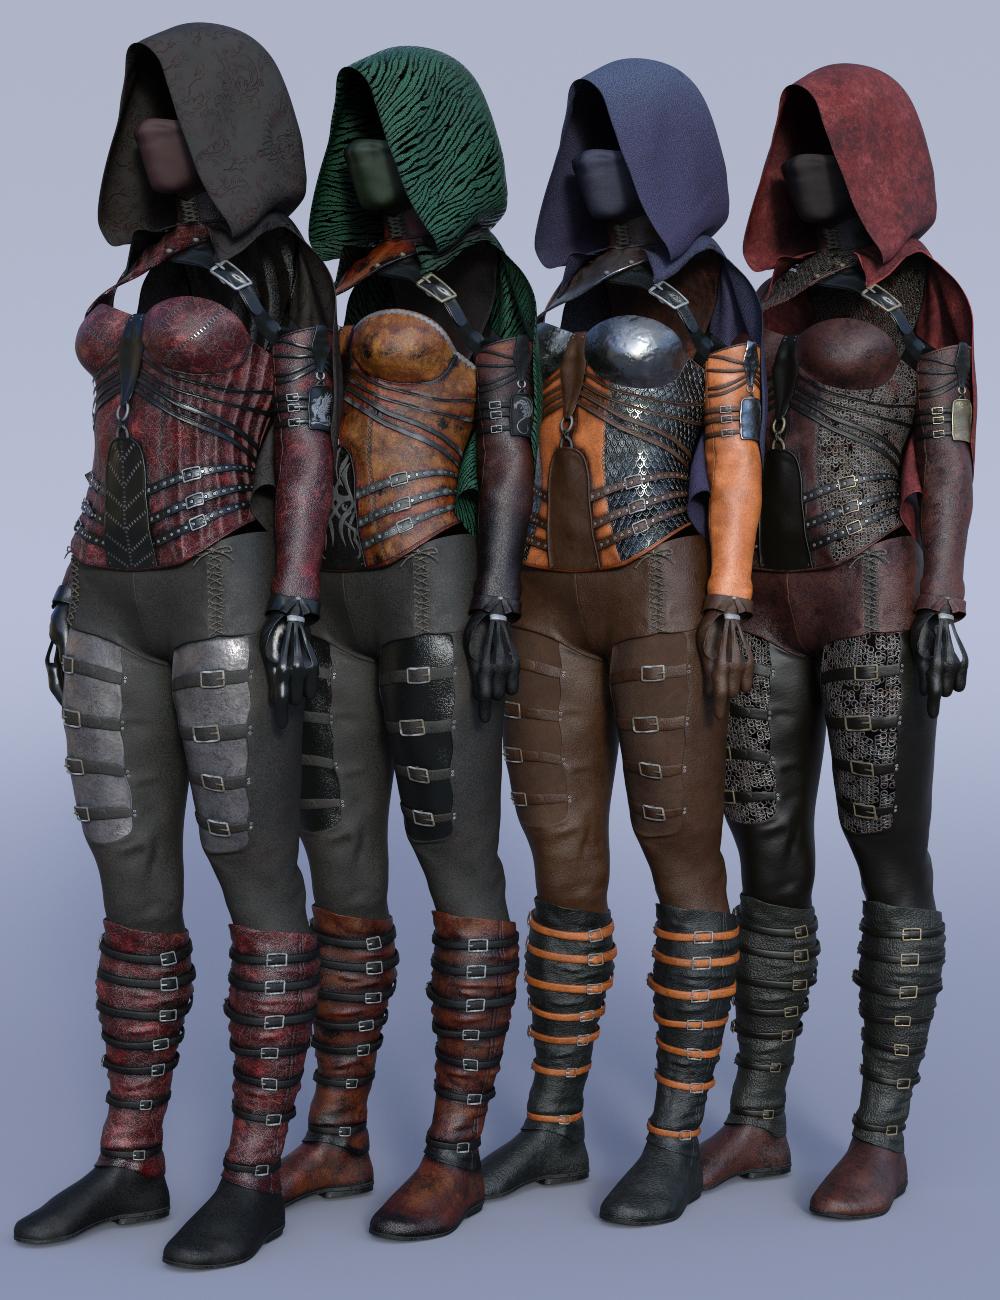 dForce Crimsoneye Outfit Textures by: Moonscape GraphicsSade, 3D Models by Daz 3D